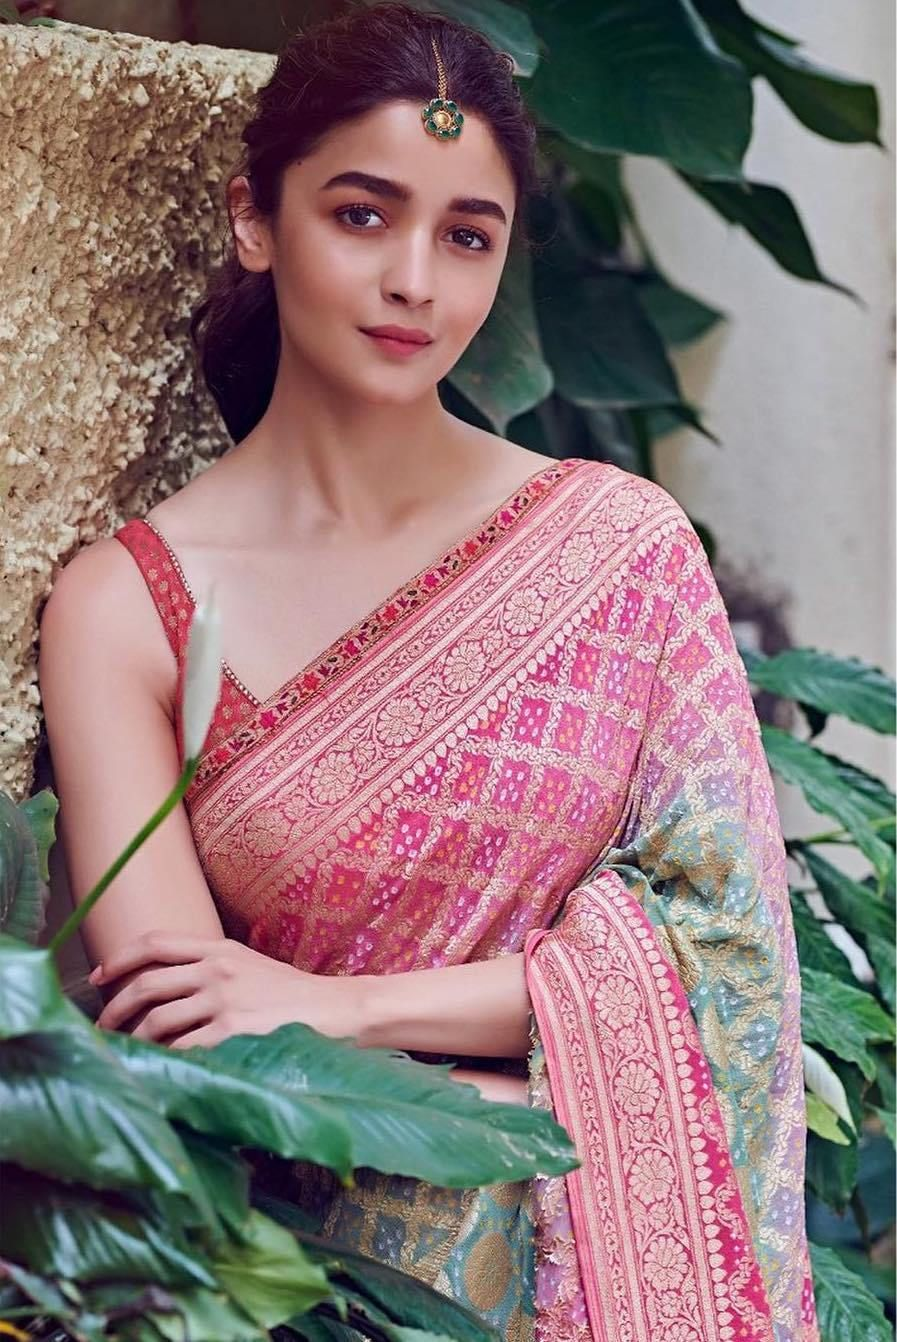 Alia bhatt in a U neckline.